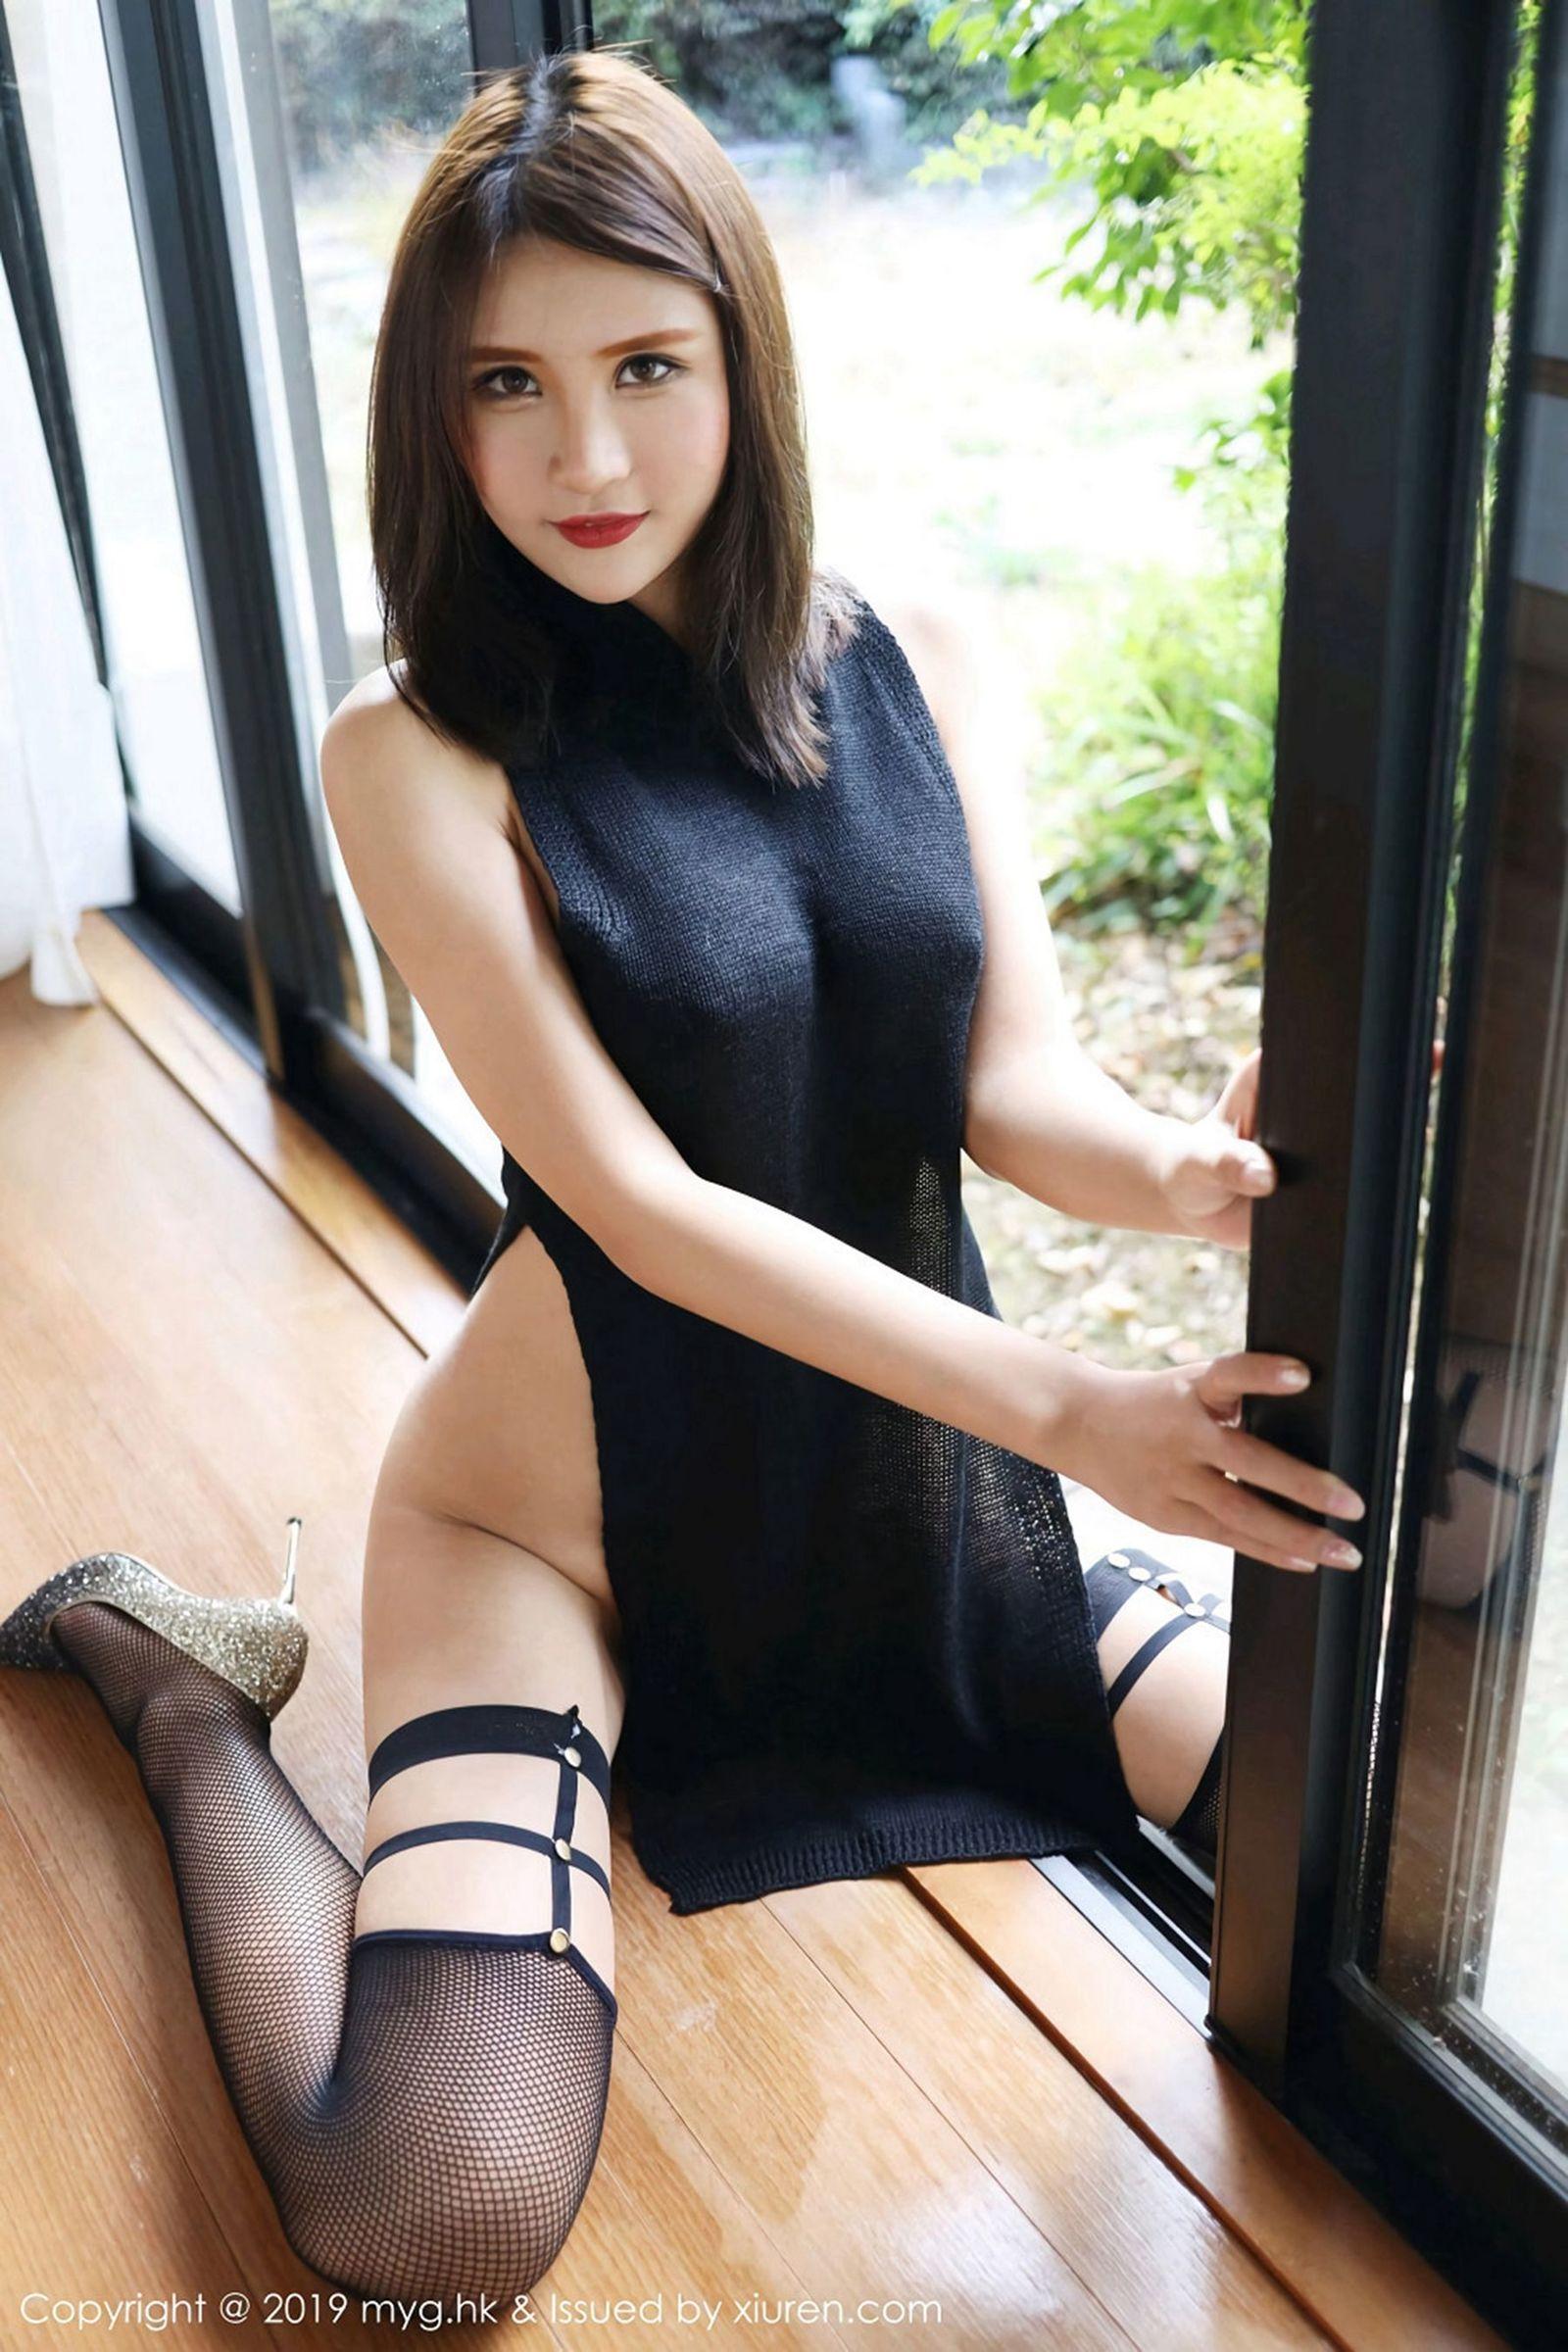 [MyGirl美媛馆] Vol.343 性感女神@SOLO-尹菲魅惑丝袜美图[44P]